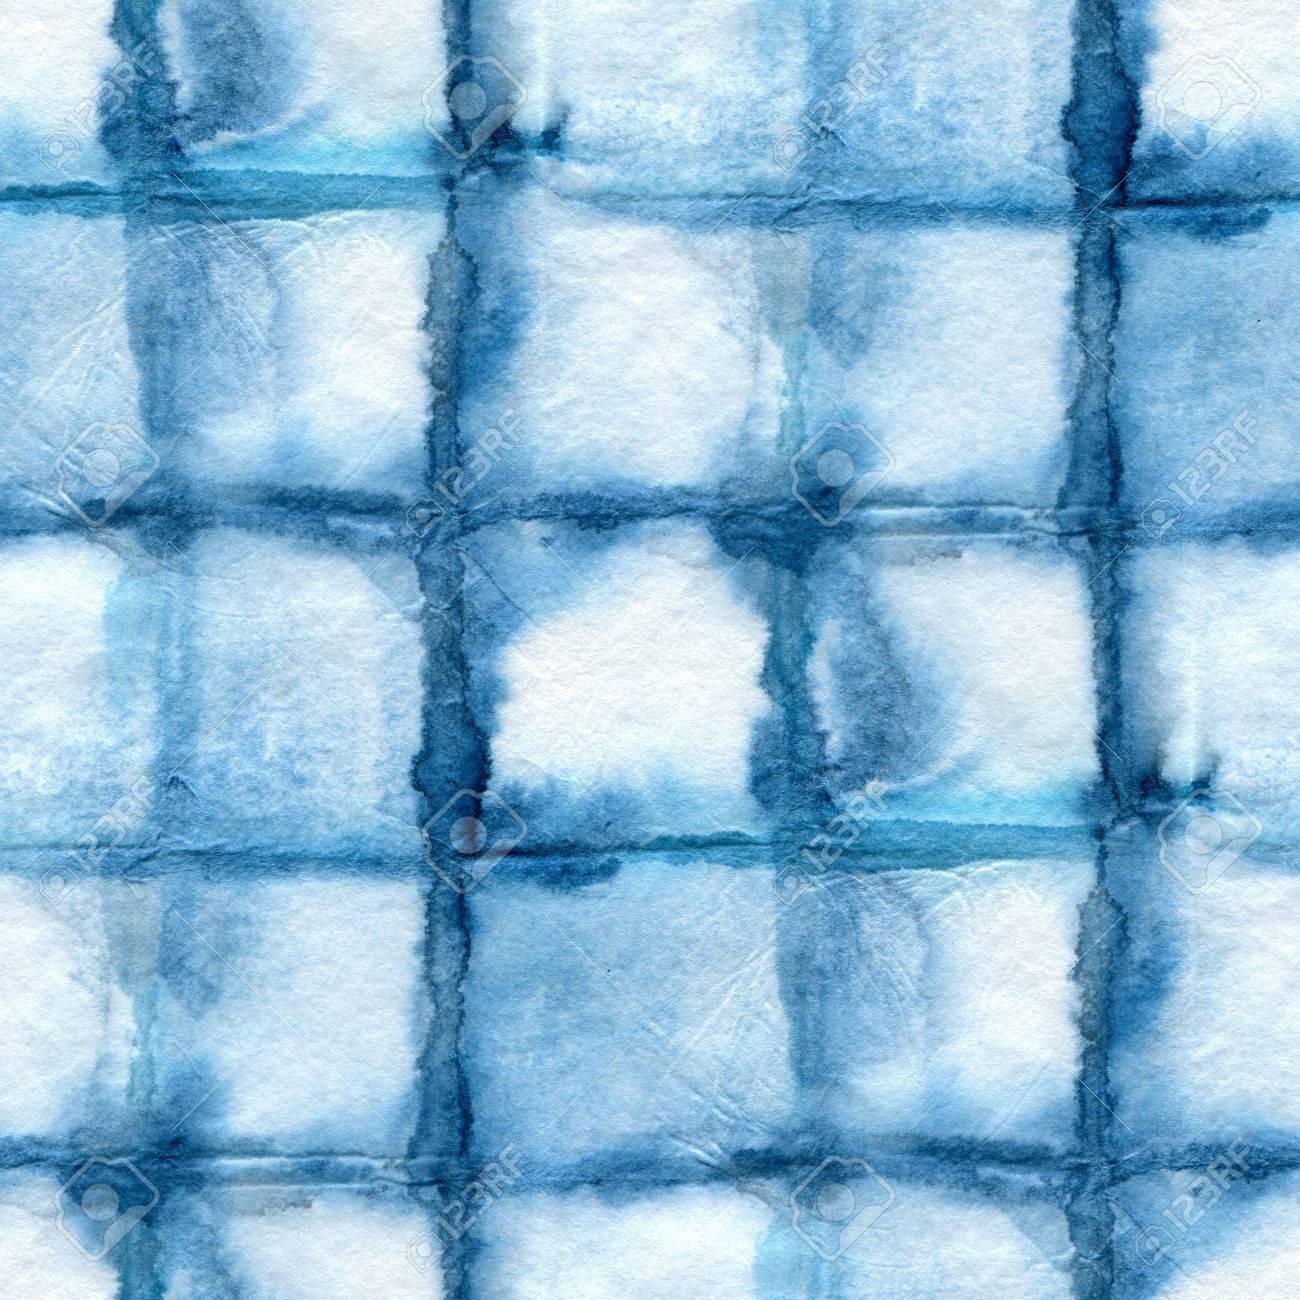 Seamless tie-dye pattern on white silk. Batik-hand painting fabrics - nodular batik. Shibori dyeing. The Indigo color. - 51847469